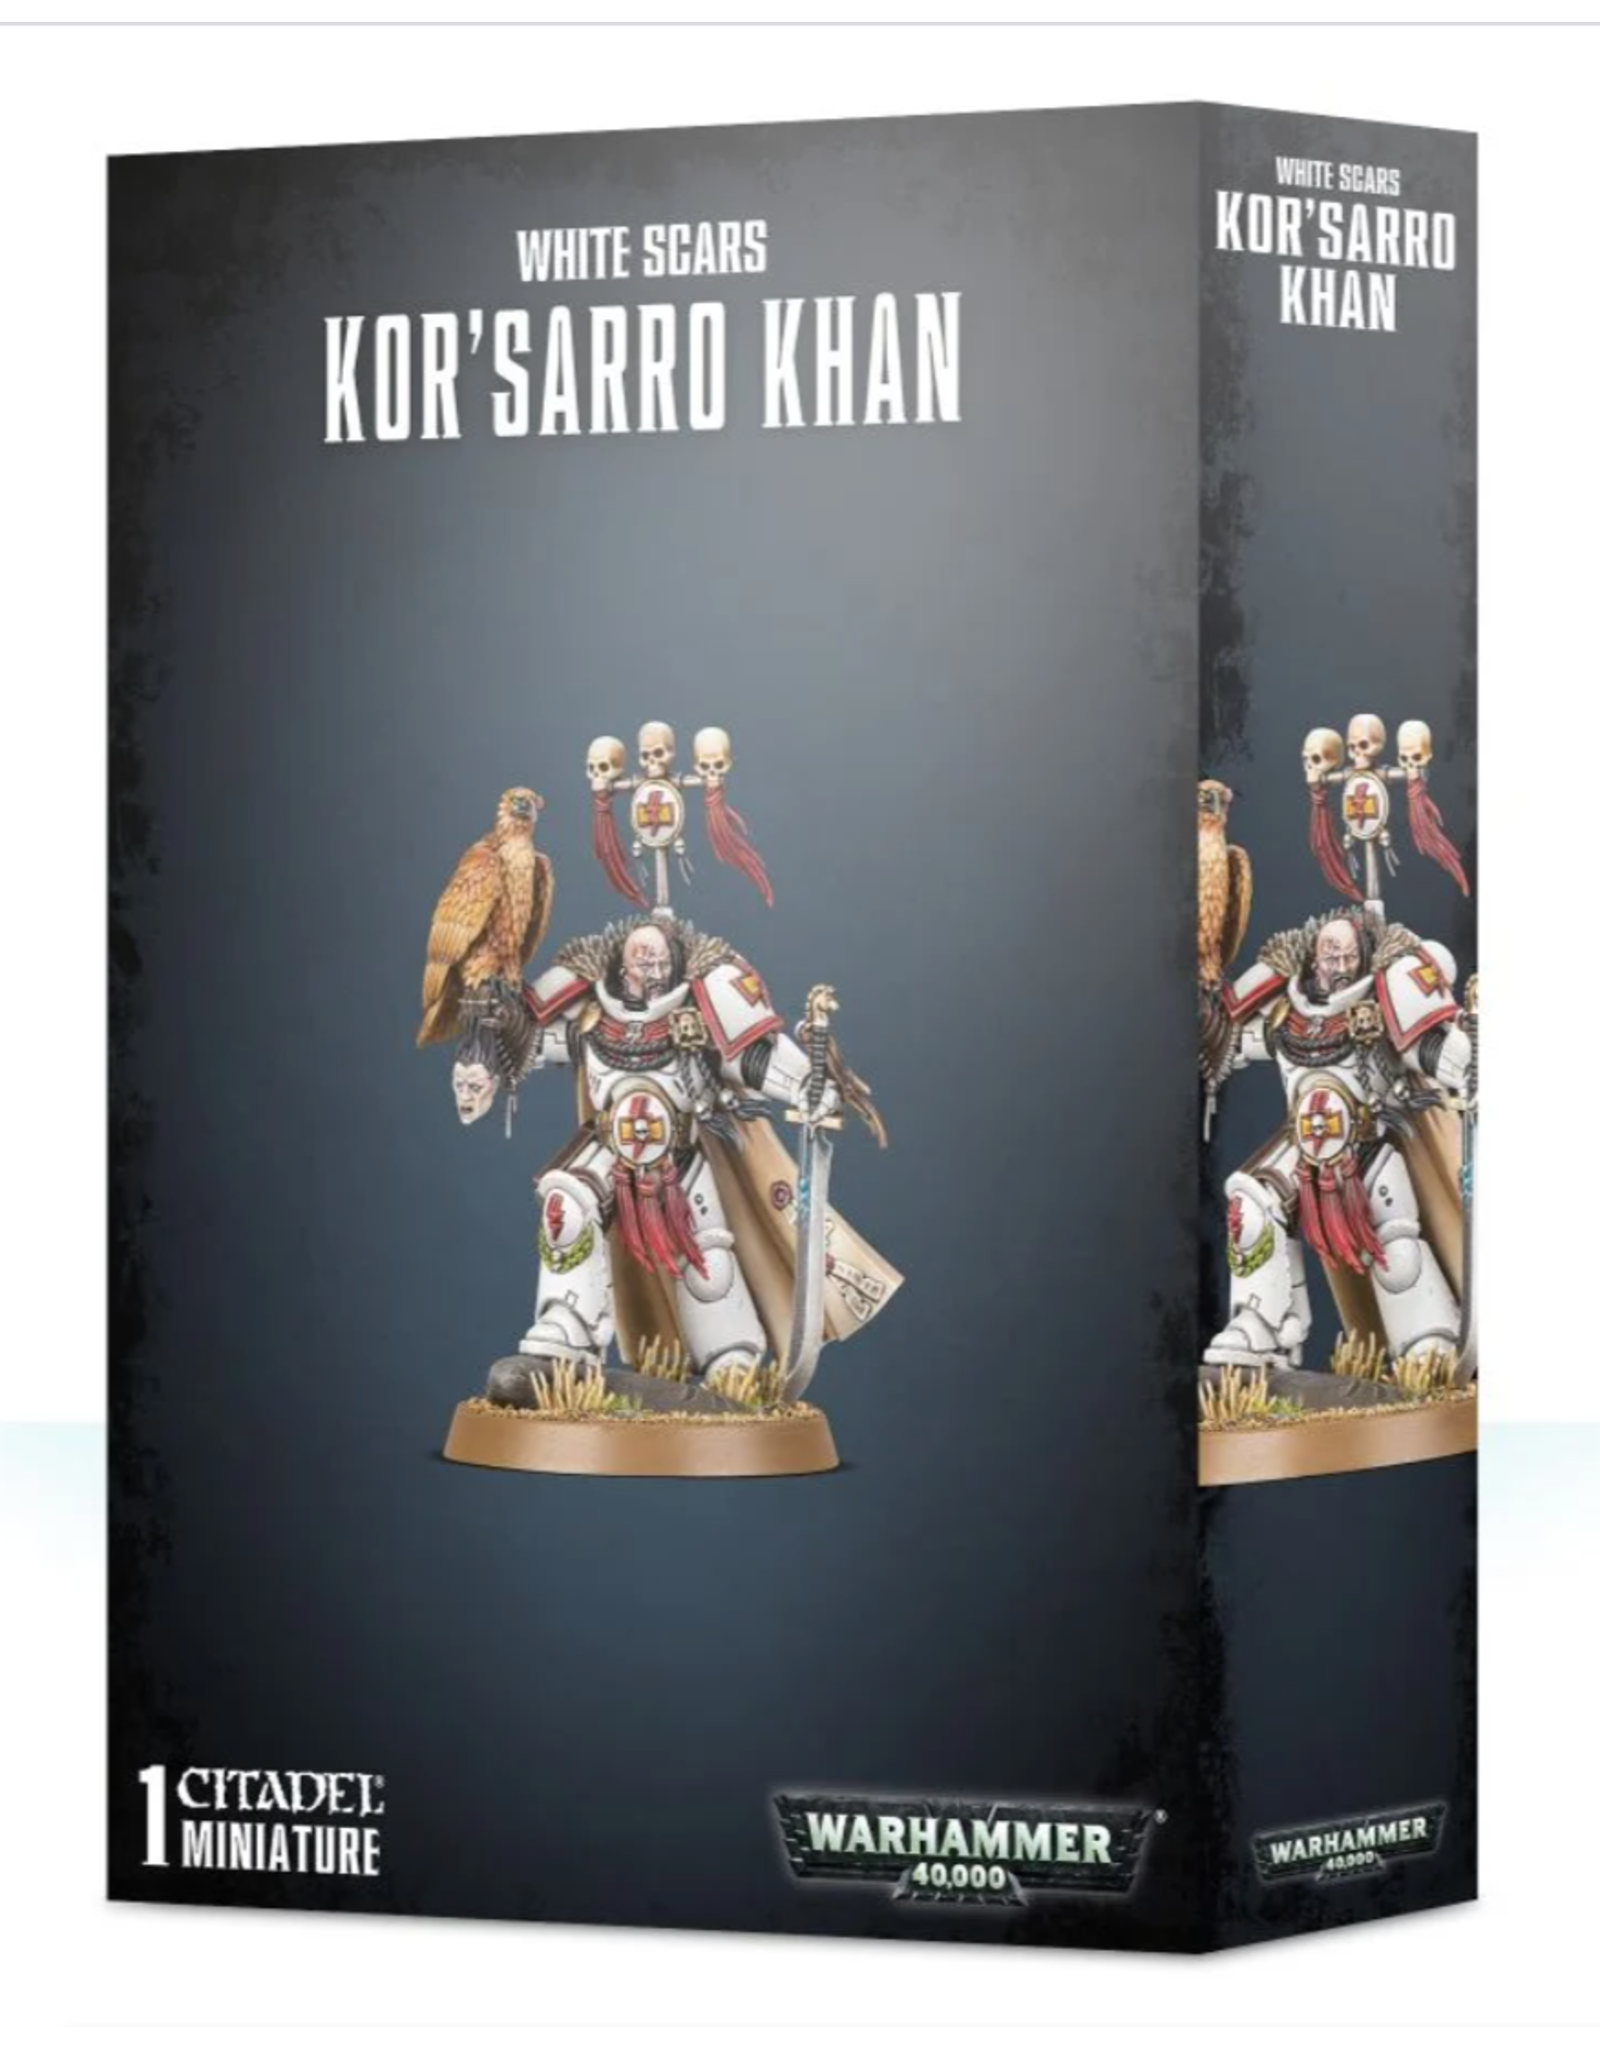 Warhammer 40K Space Marine White Scars Kor'Sarro Khan